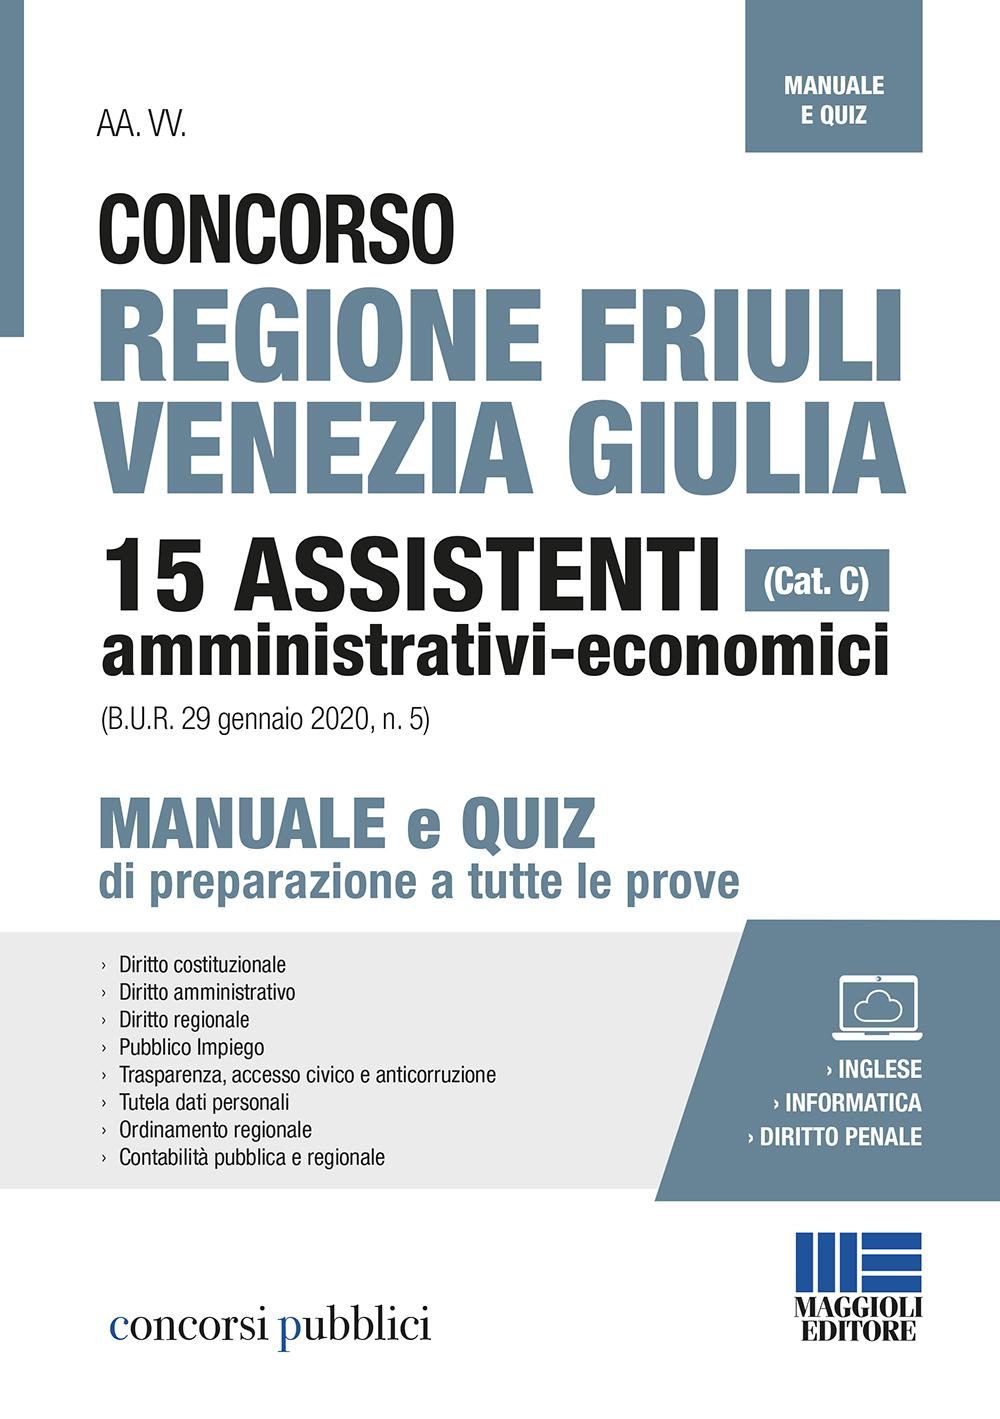 Concorso Regione Friuli Venezia Giulia (Cat. C) 15 Assi